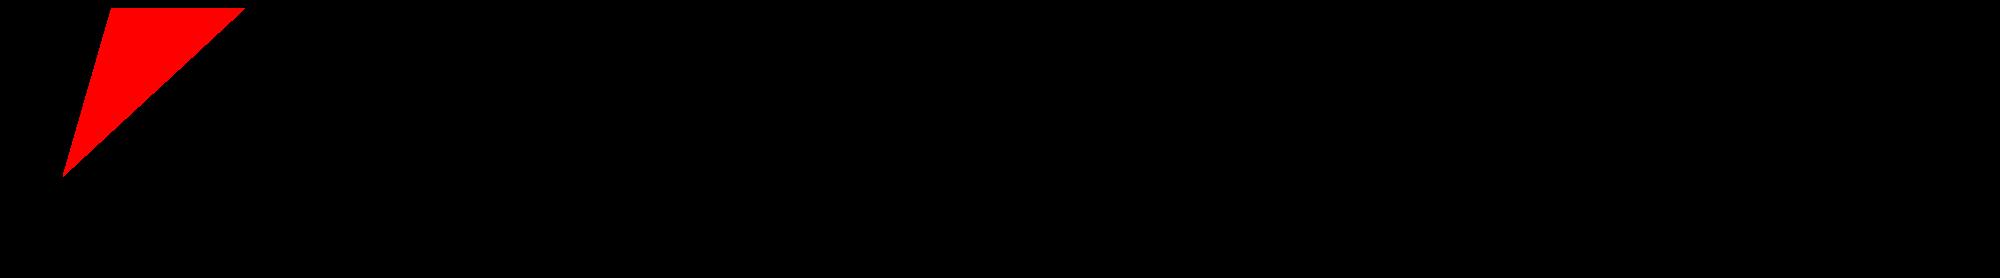 Bridgestone_logo